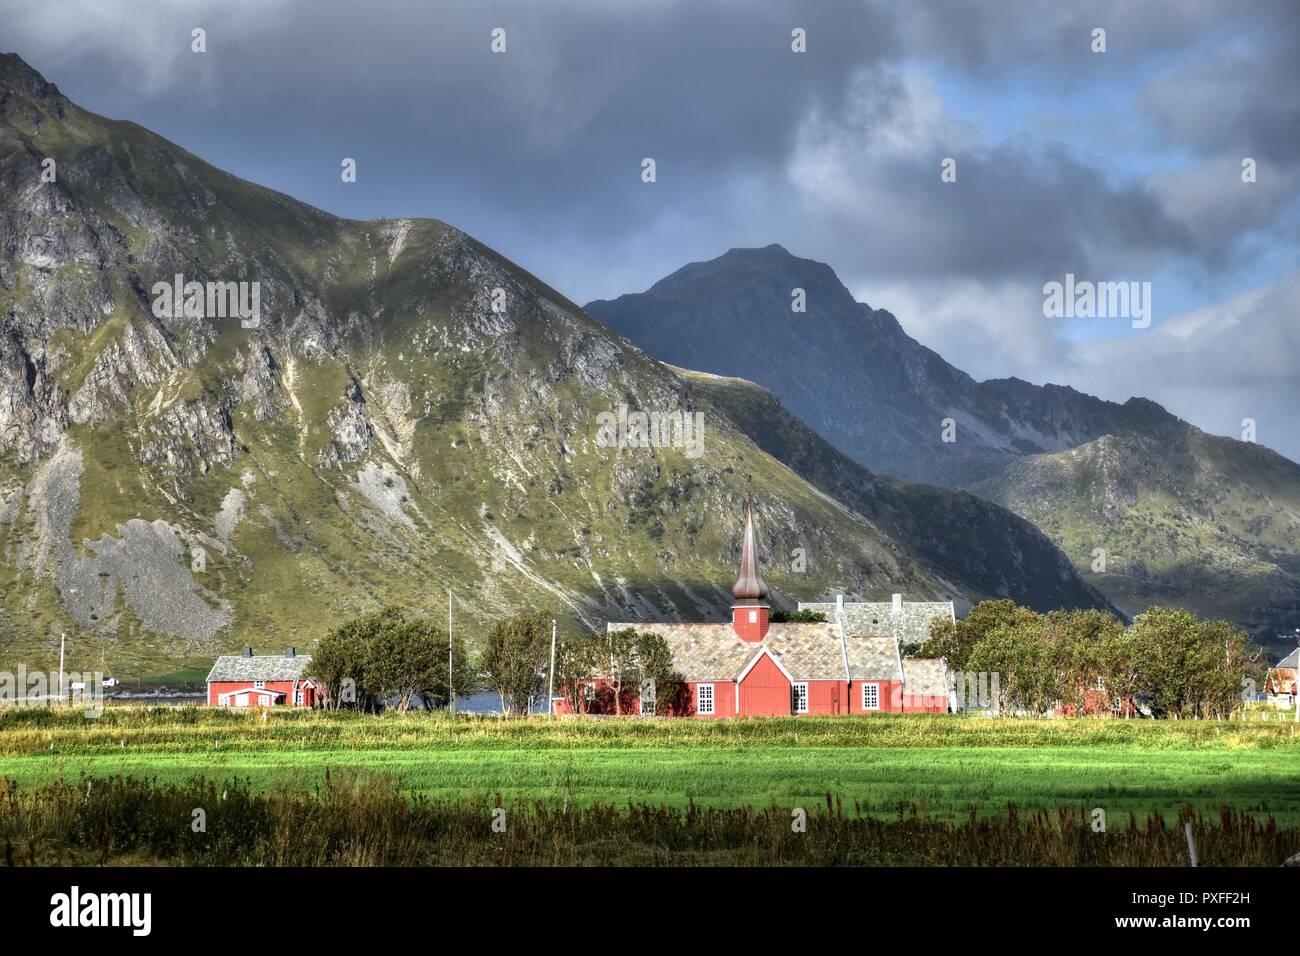 Norwegen, Lofoten, Flakstad, Flakstadpollen, Kirche, Abend, Dämmerung, Fjord, Vareisundet, Nordland, Ramberg, Flakstadøy, Moskenesøy, E10, Kong Olavs - Stock Image